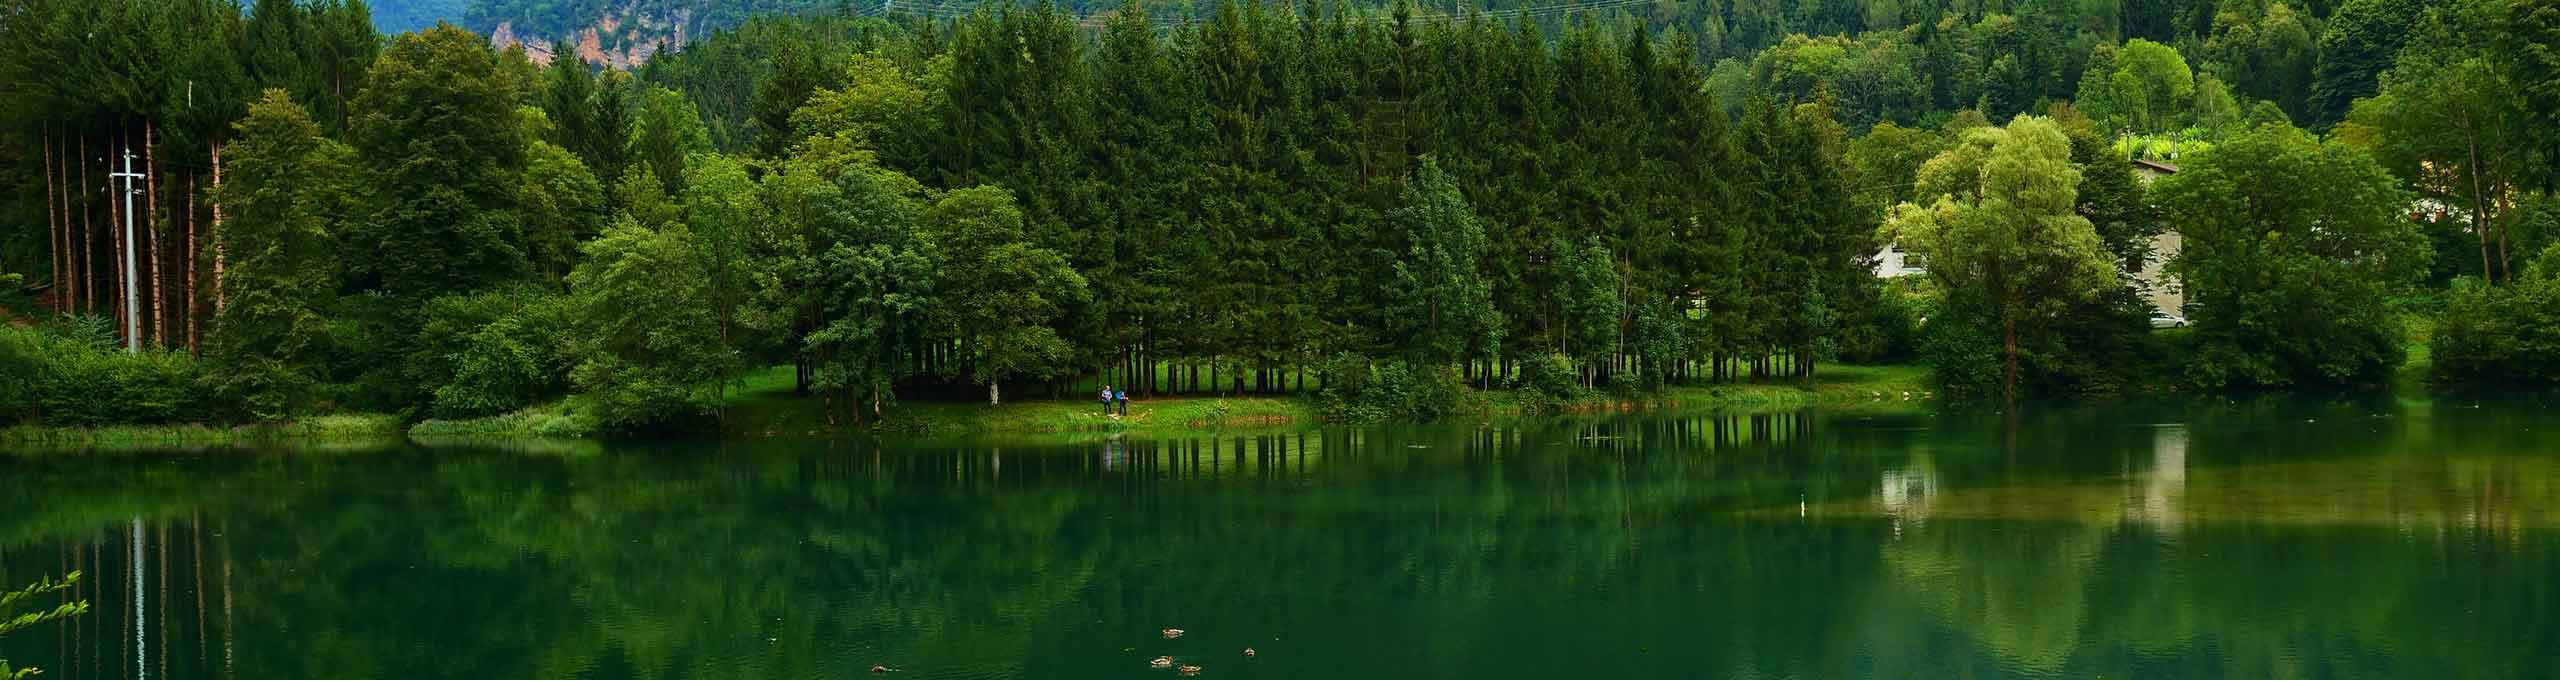 Brenna, Val Brembana, Lago di Lenna